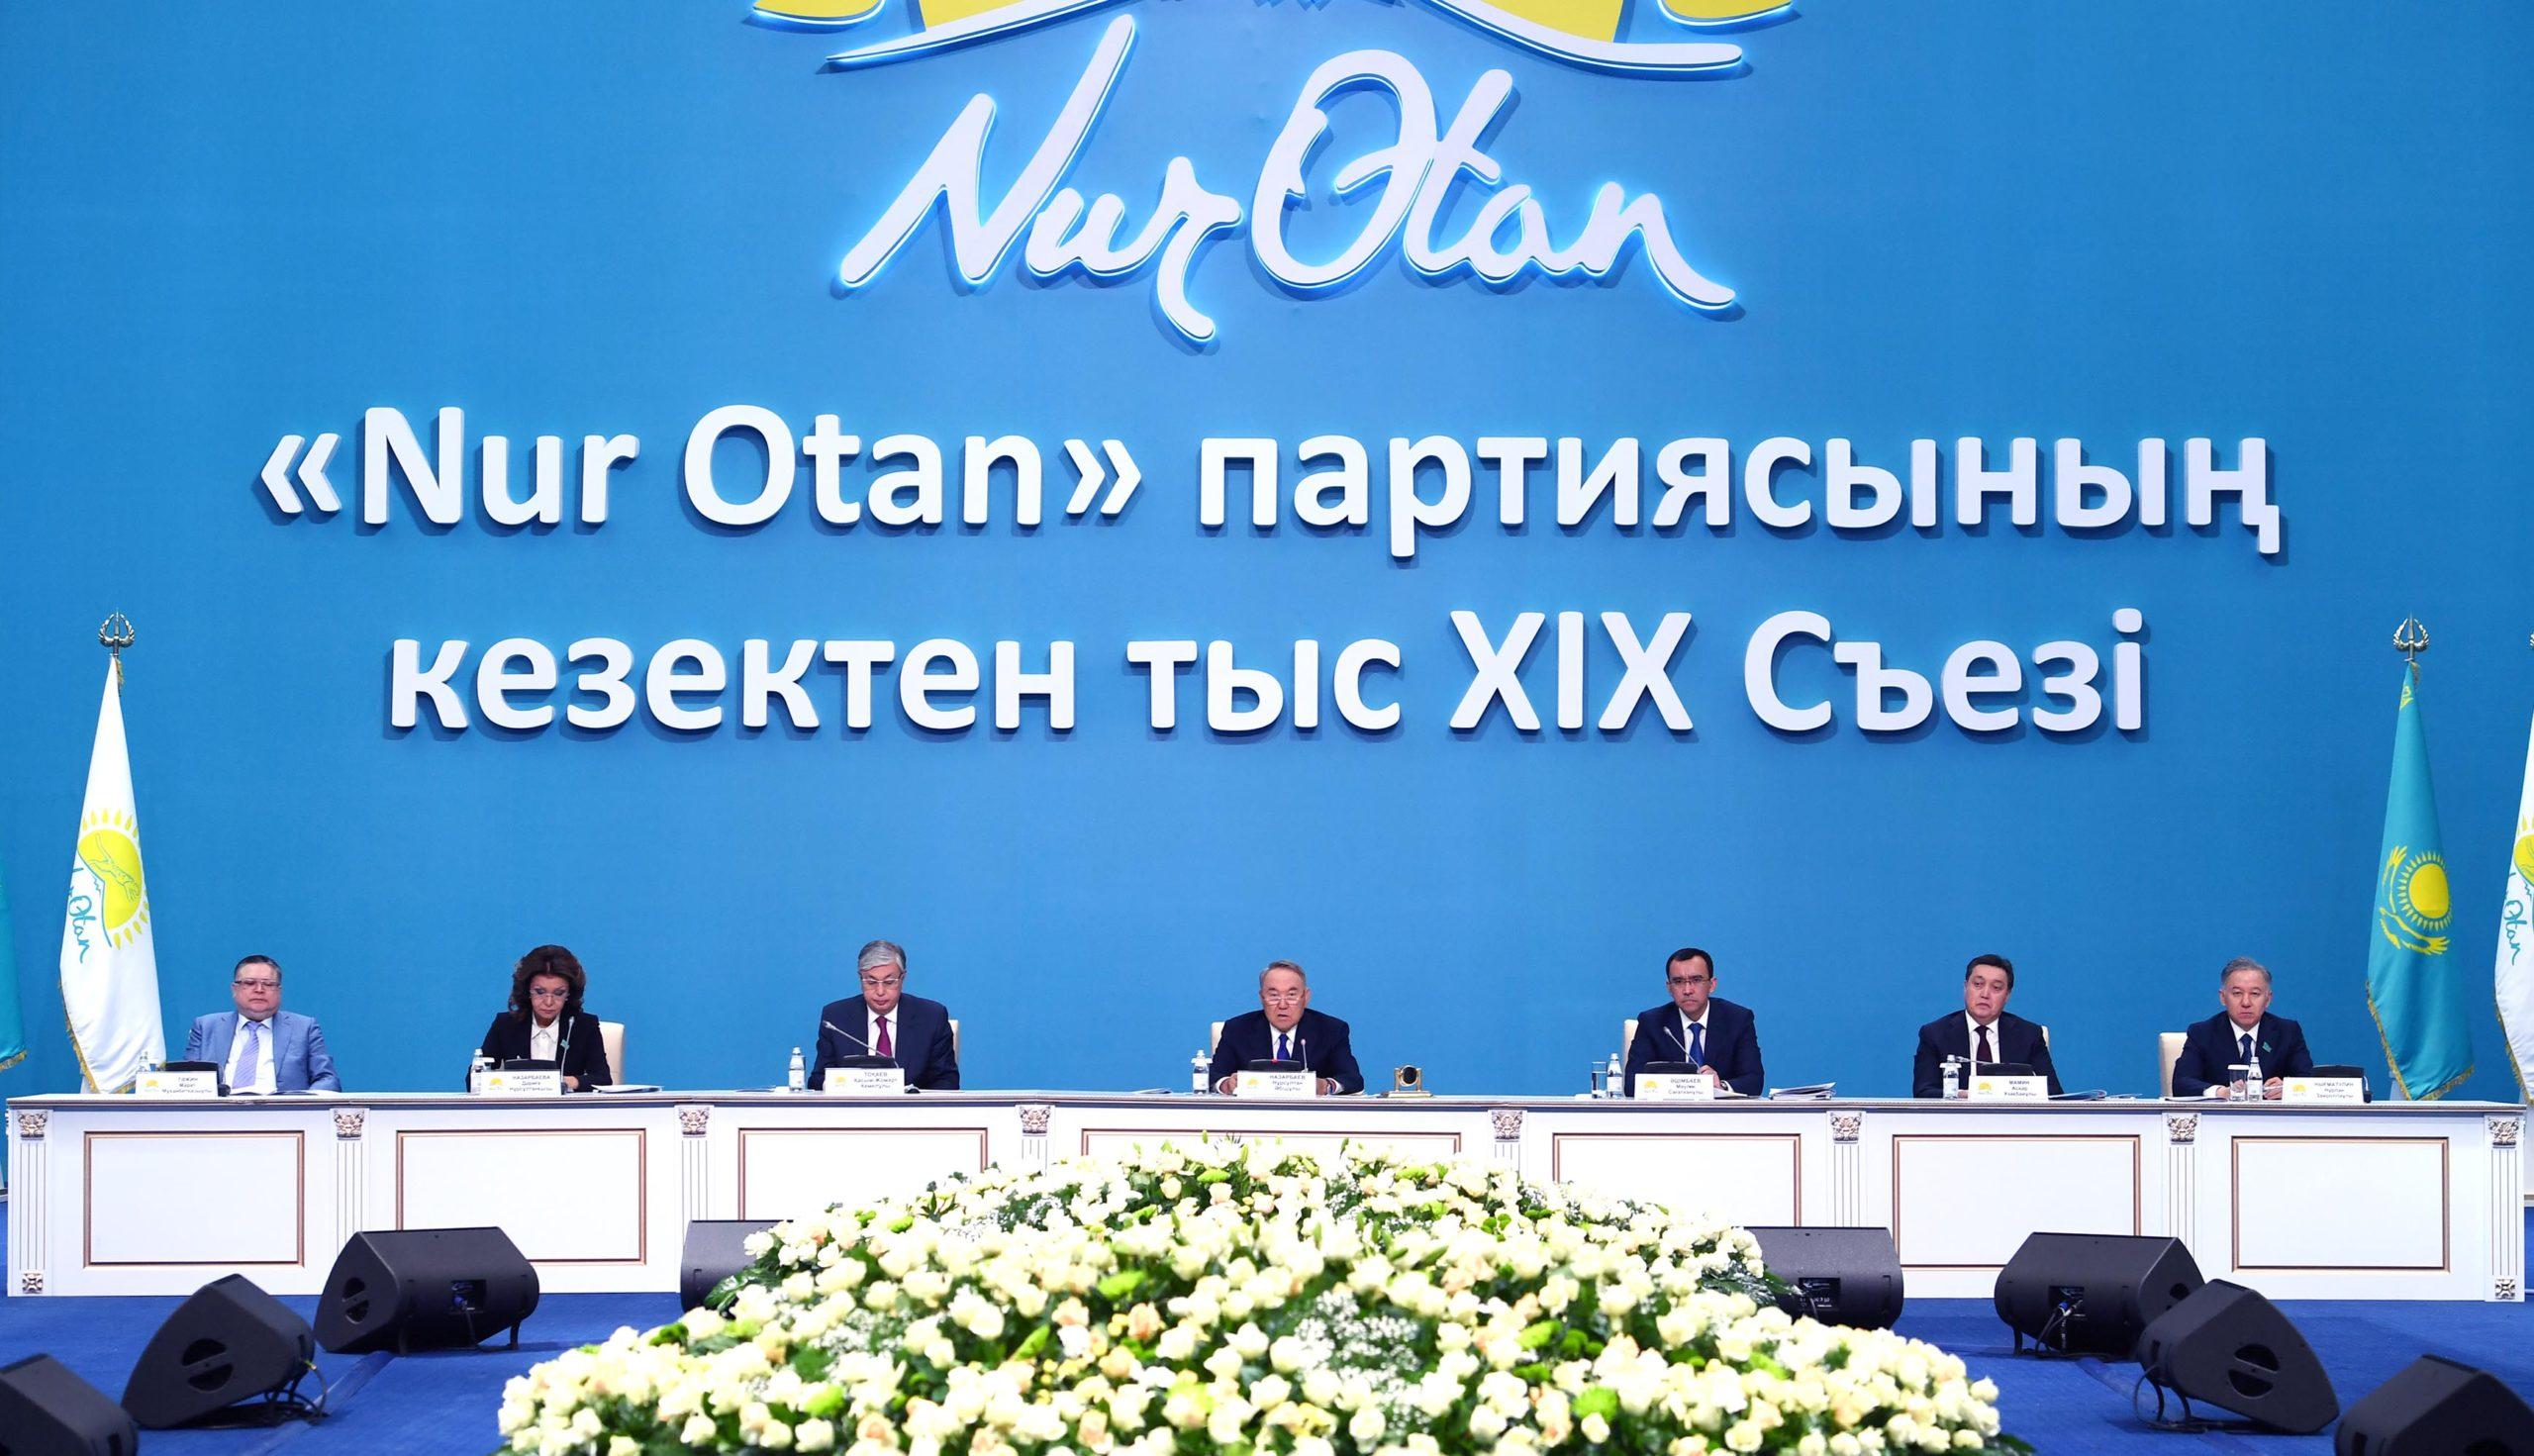 Полное обращение Нурсултана Назарбаева на ХІХ Съезде партии «Nur Otan»